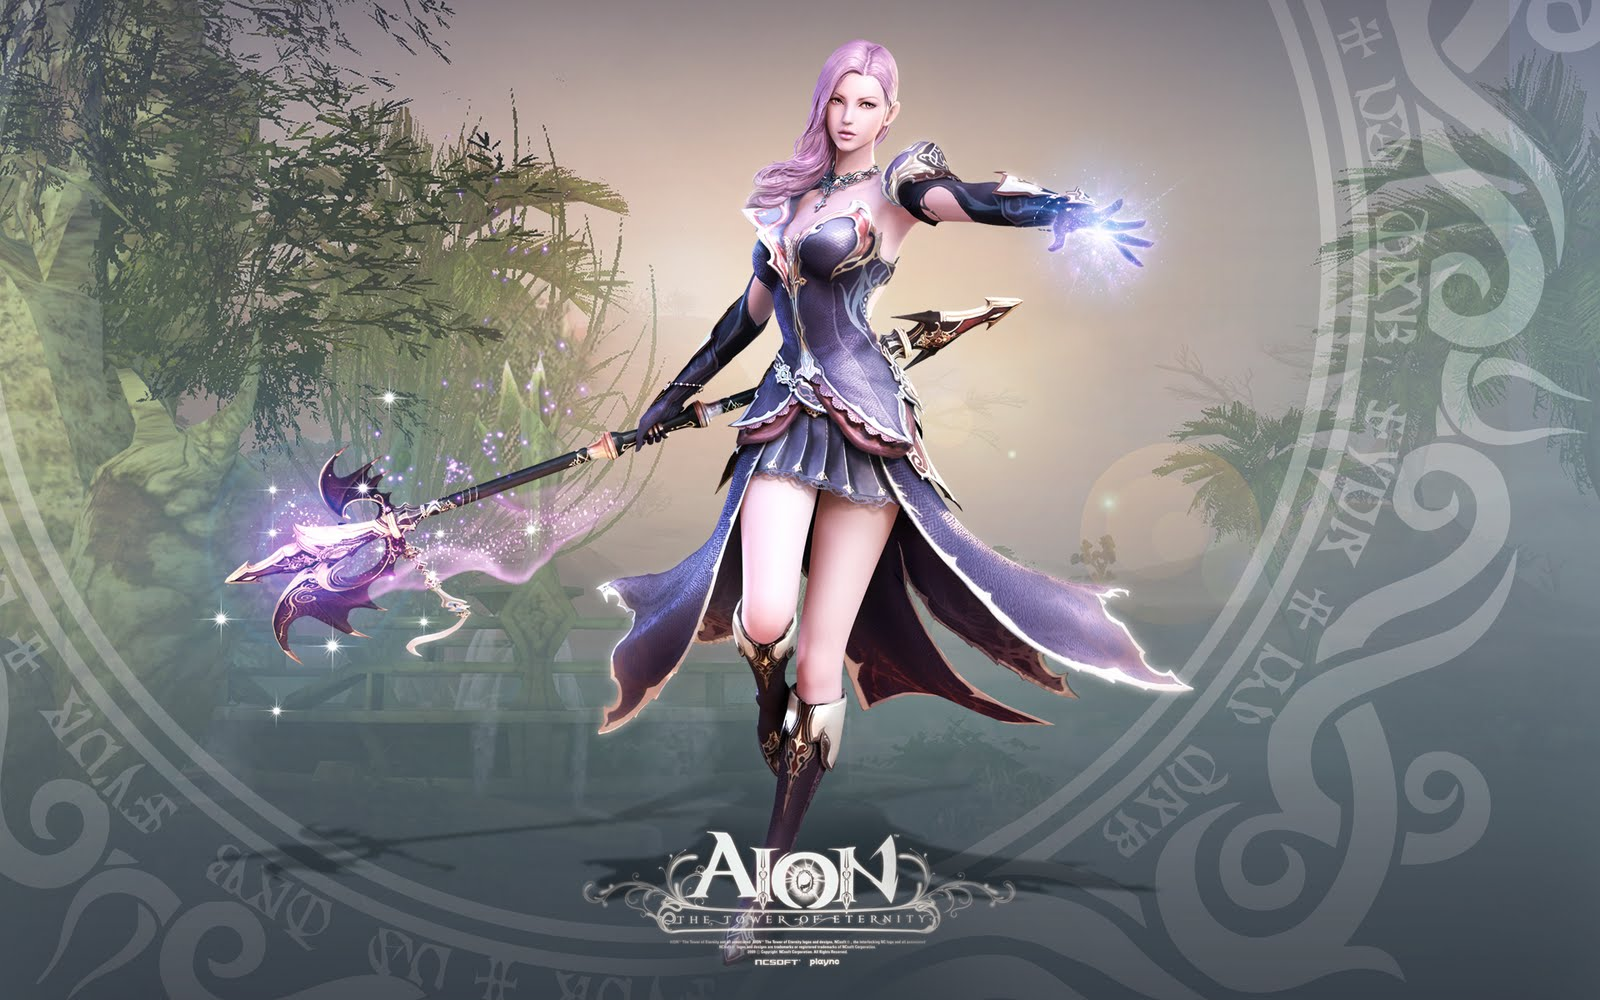 http://1.bp.blogspot.com/-hi_MjnnYGPg/TaJX7bsru-I/AAAAAAAABRY/Y9CtPZSN-_A/s1600/AION-Wallpaper-Screenshot-PC-Game-Online-25.jpg